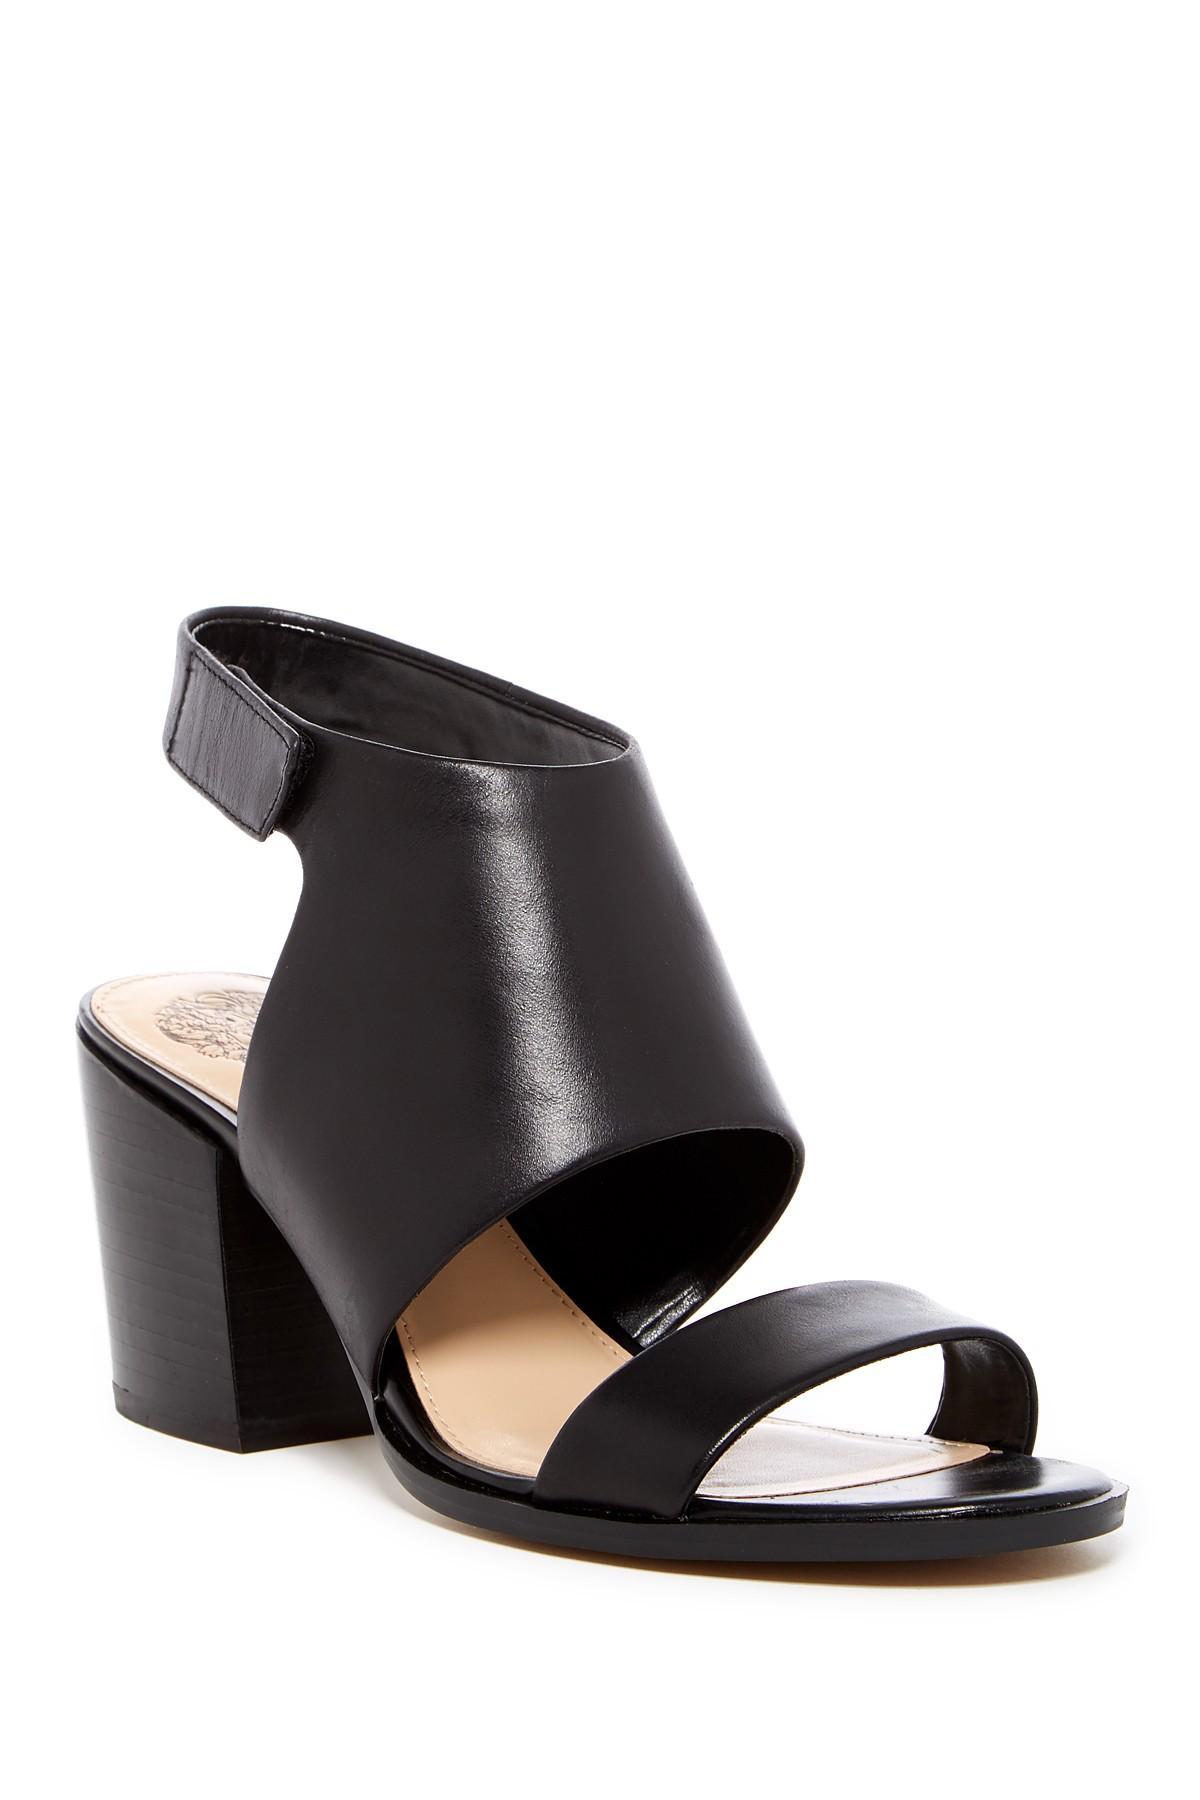 24f33e76238 Lyst - Vince Camuto Leena Block Heel Leather Sandal in Black